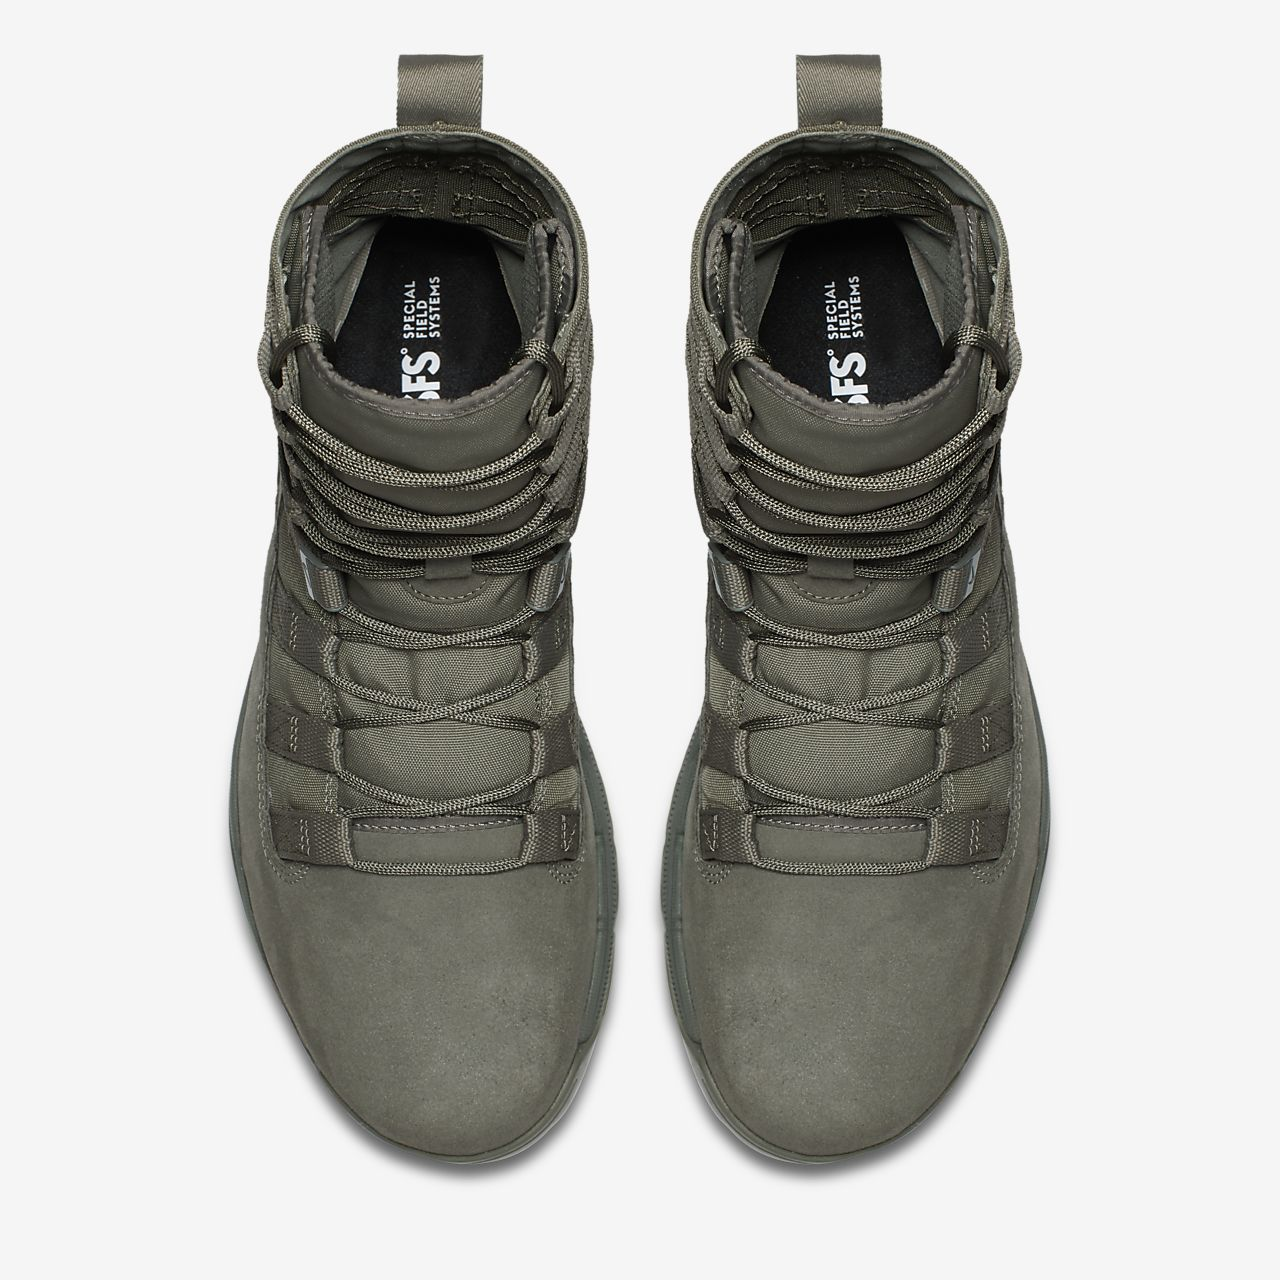 1c6cf48cd85 Nike SFB Gen 2 8